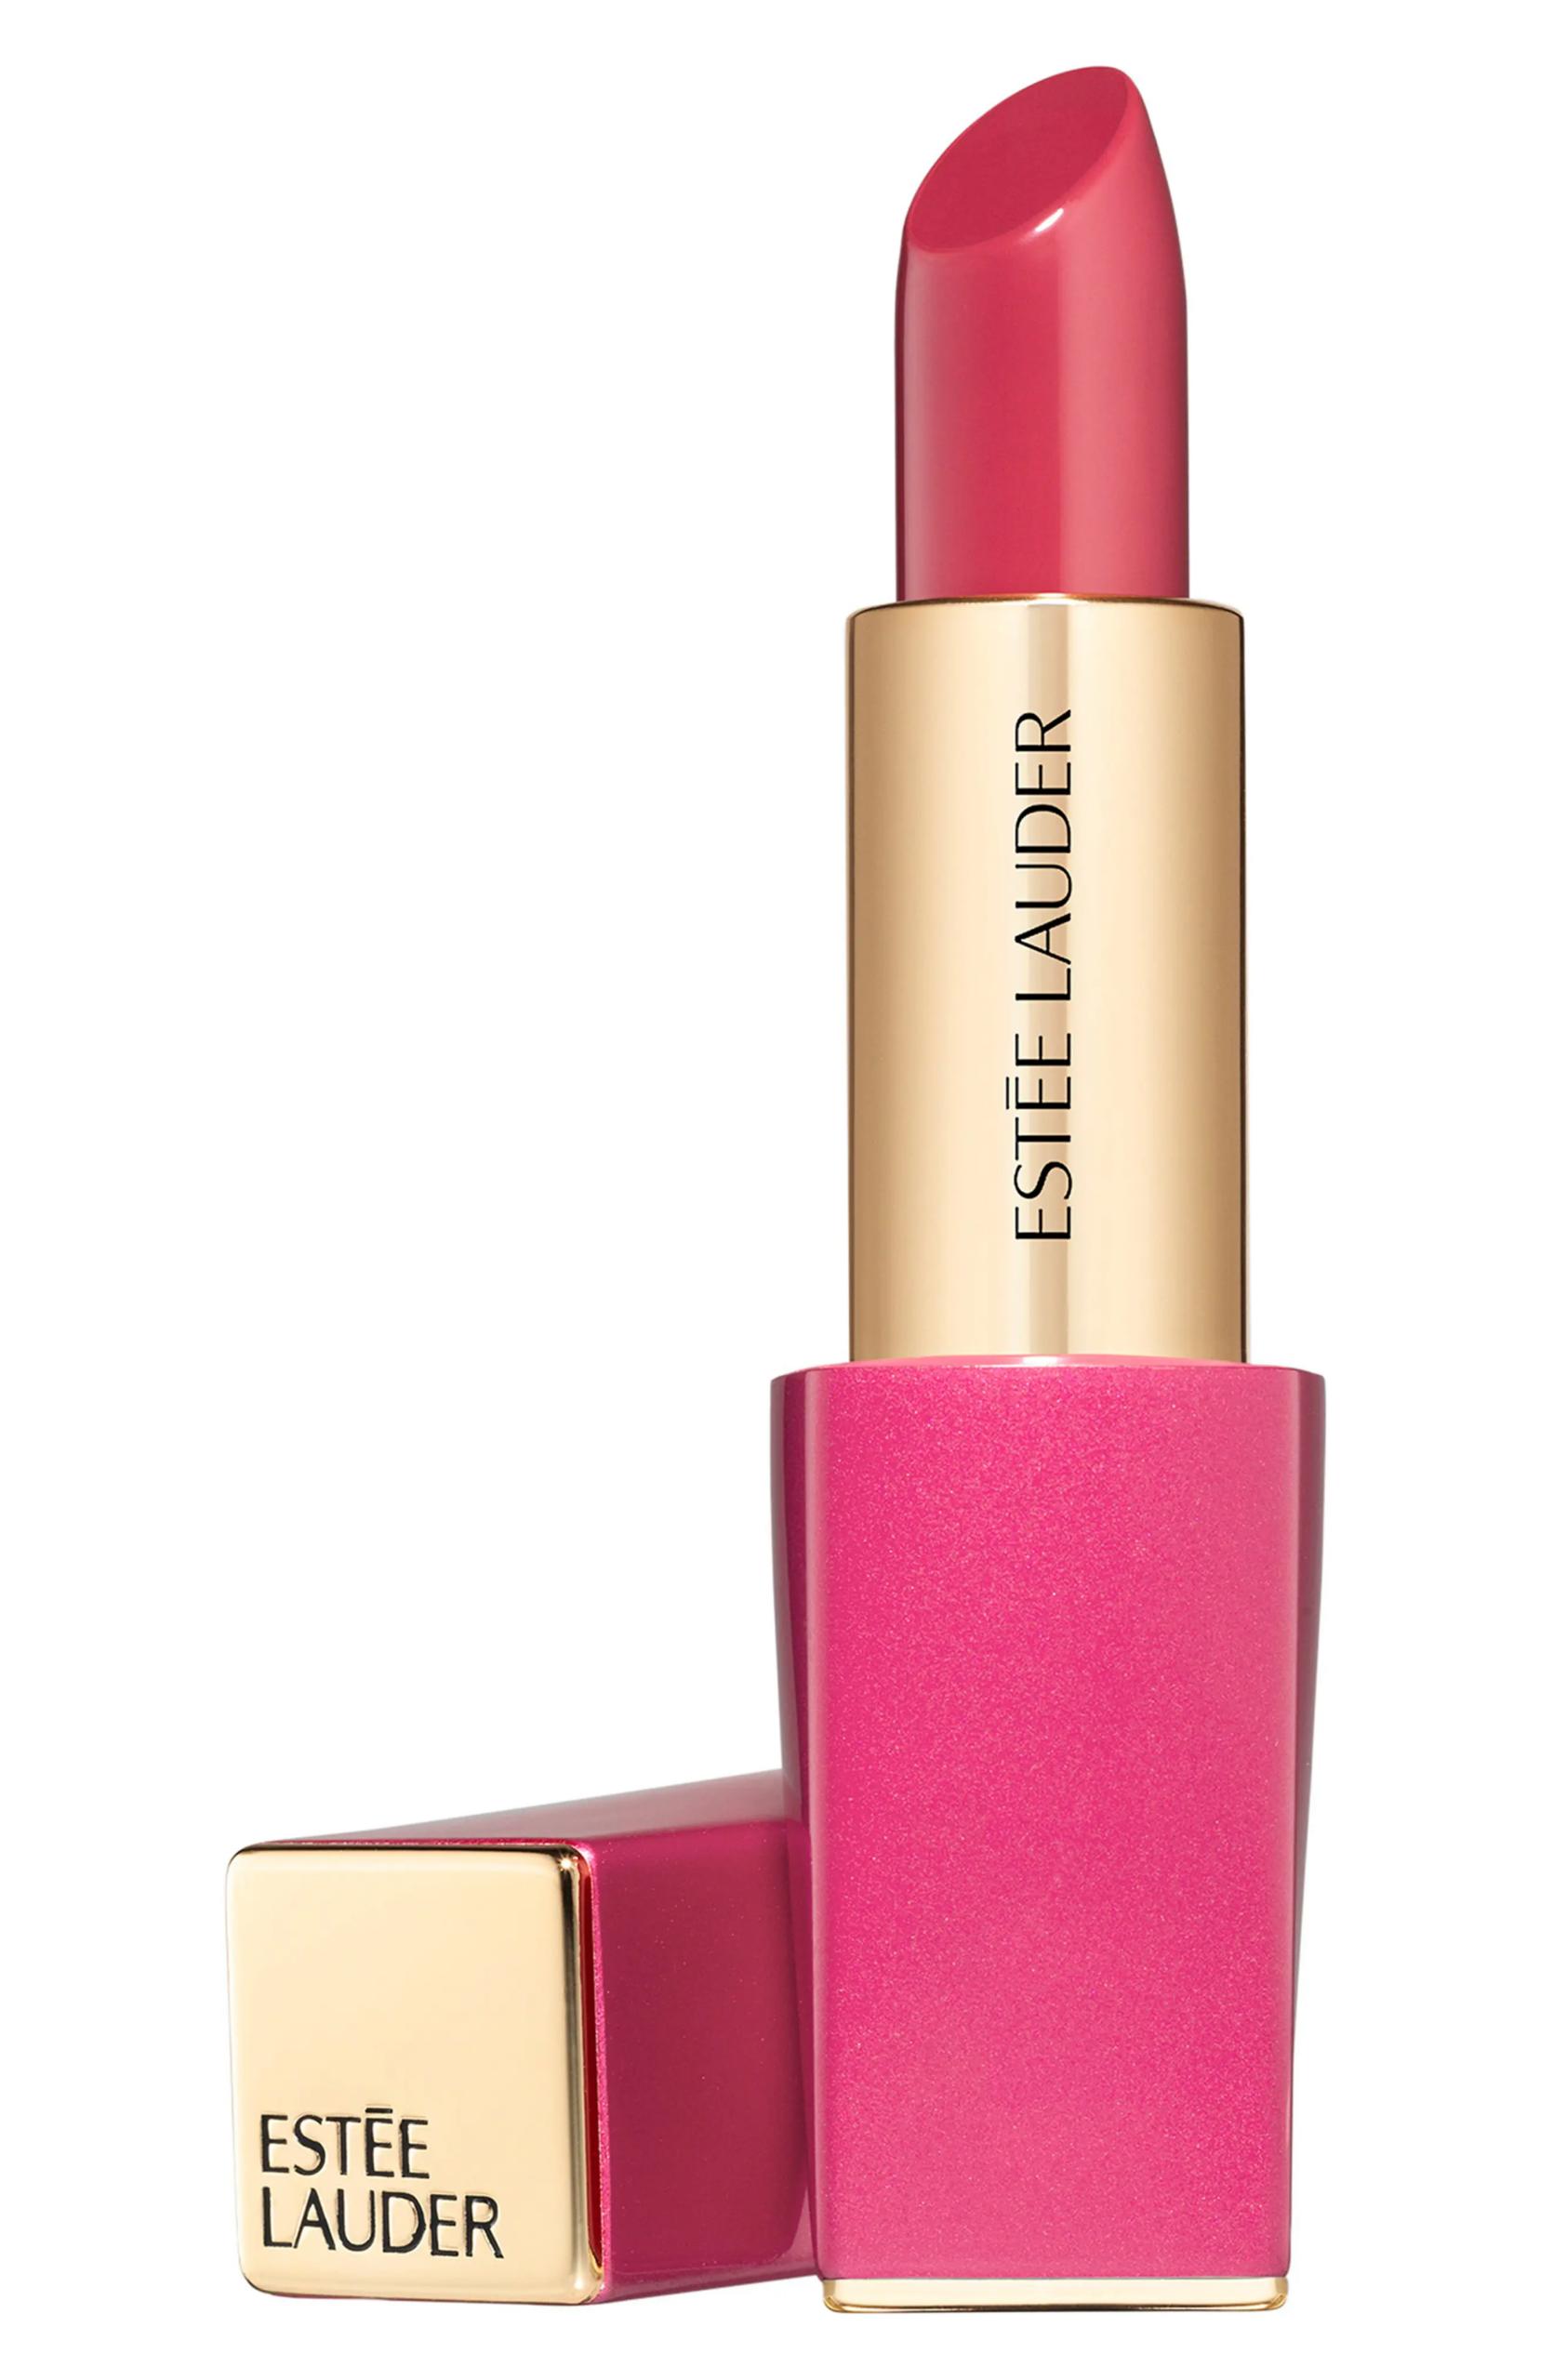 Estee Lauder Rebellious Rose Pure Color Envy Sculpting Lipstick